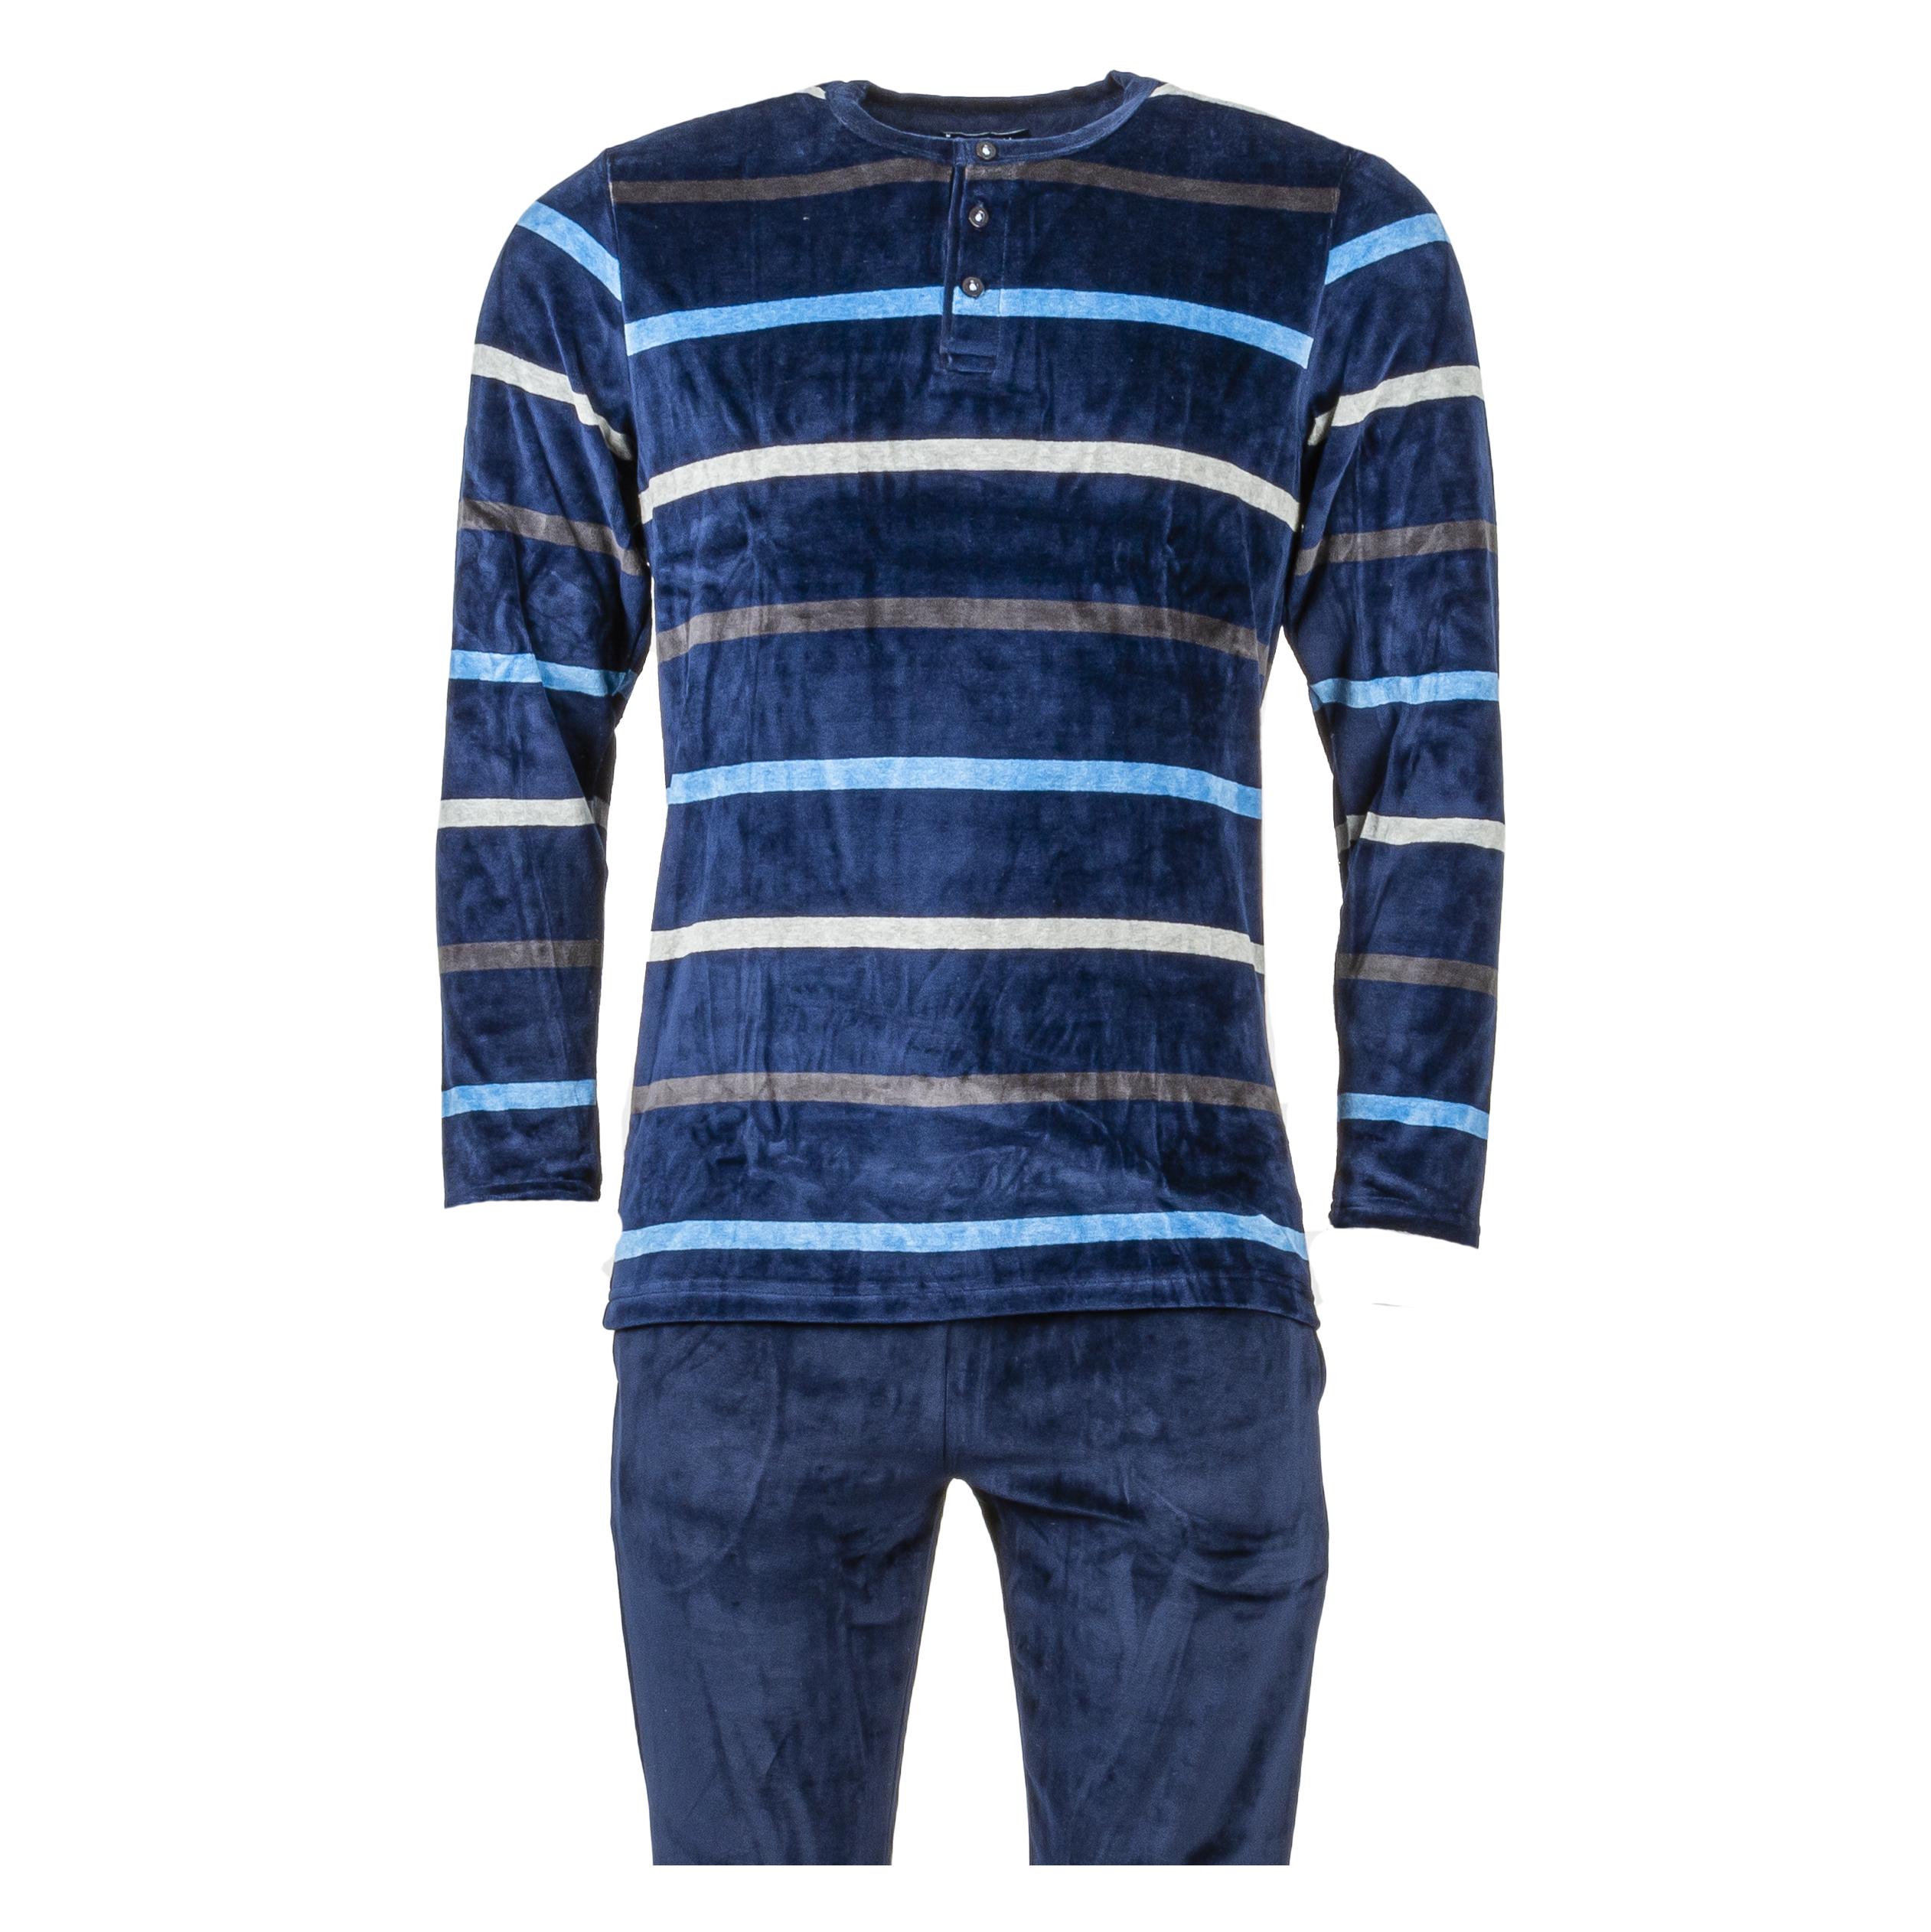 Pyjama long Gasch en velours bleu marine rayé bleu et gris